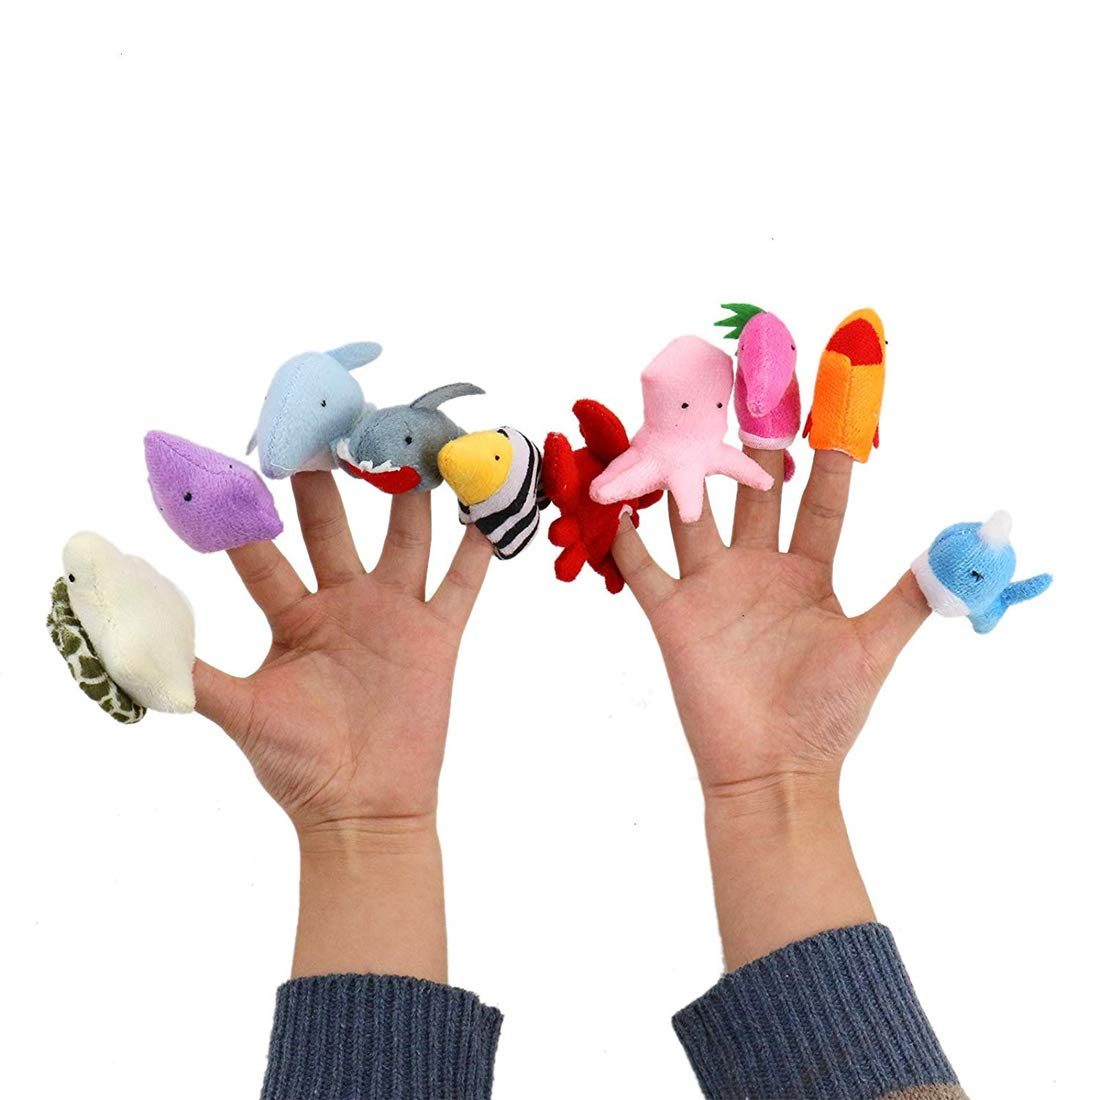 10Pcs Soft Plush Cartoon Marine Animal Shape Finger Puppet Set Toy Kids Story Telling Helper 10pcs